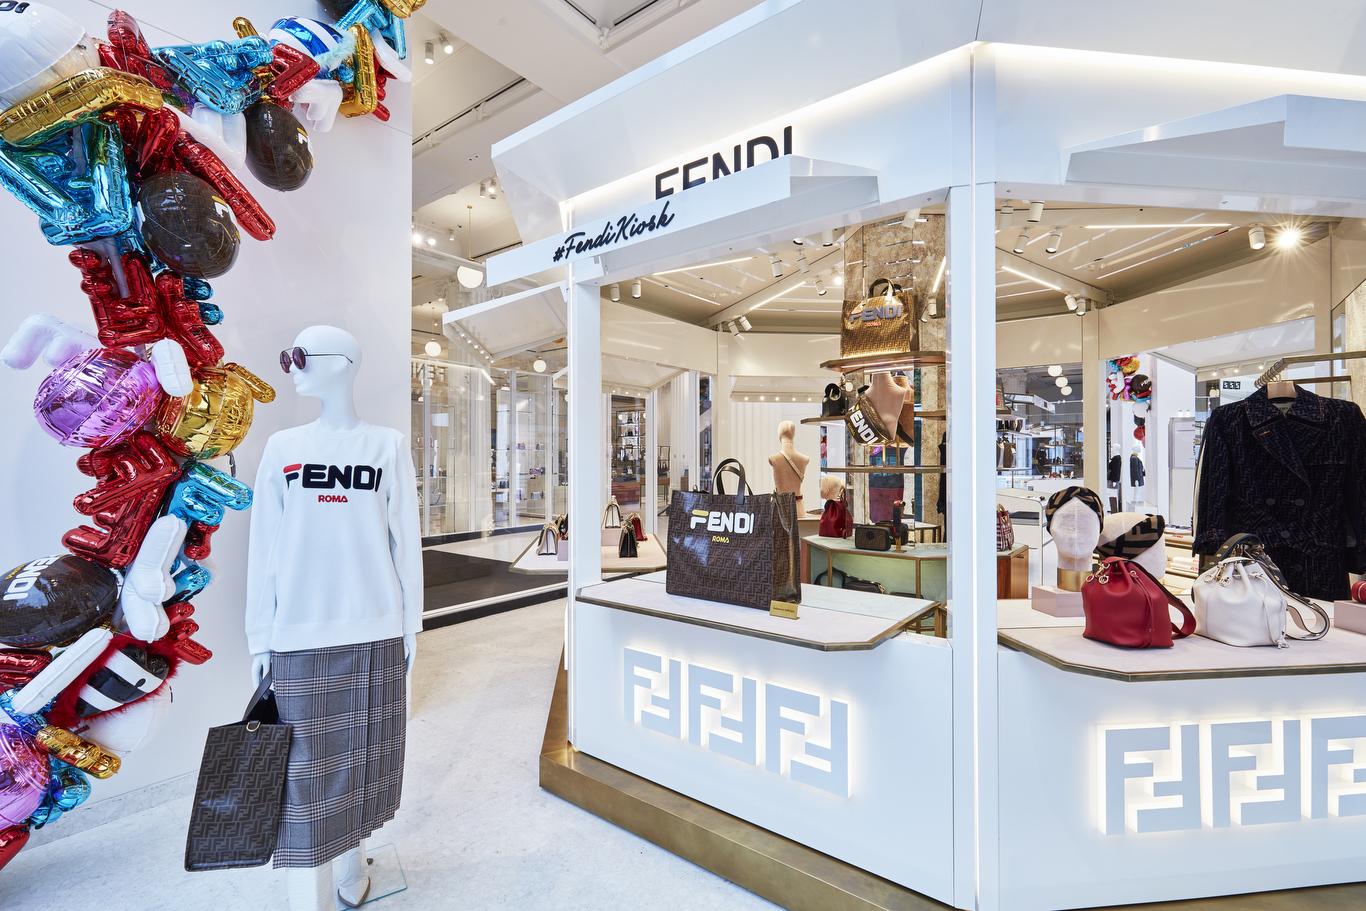 The Fendi Kiosk at Selfridges Corner Shop in London